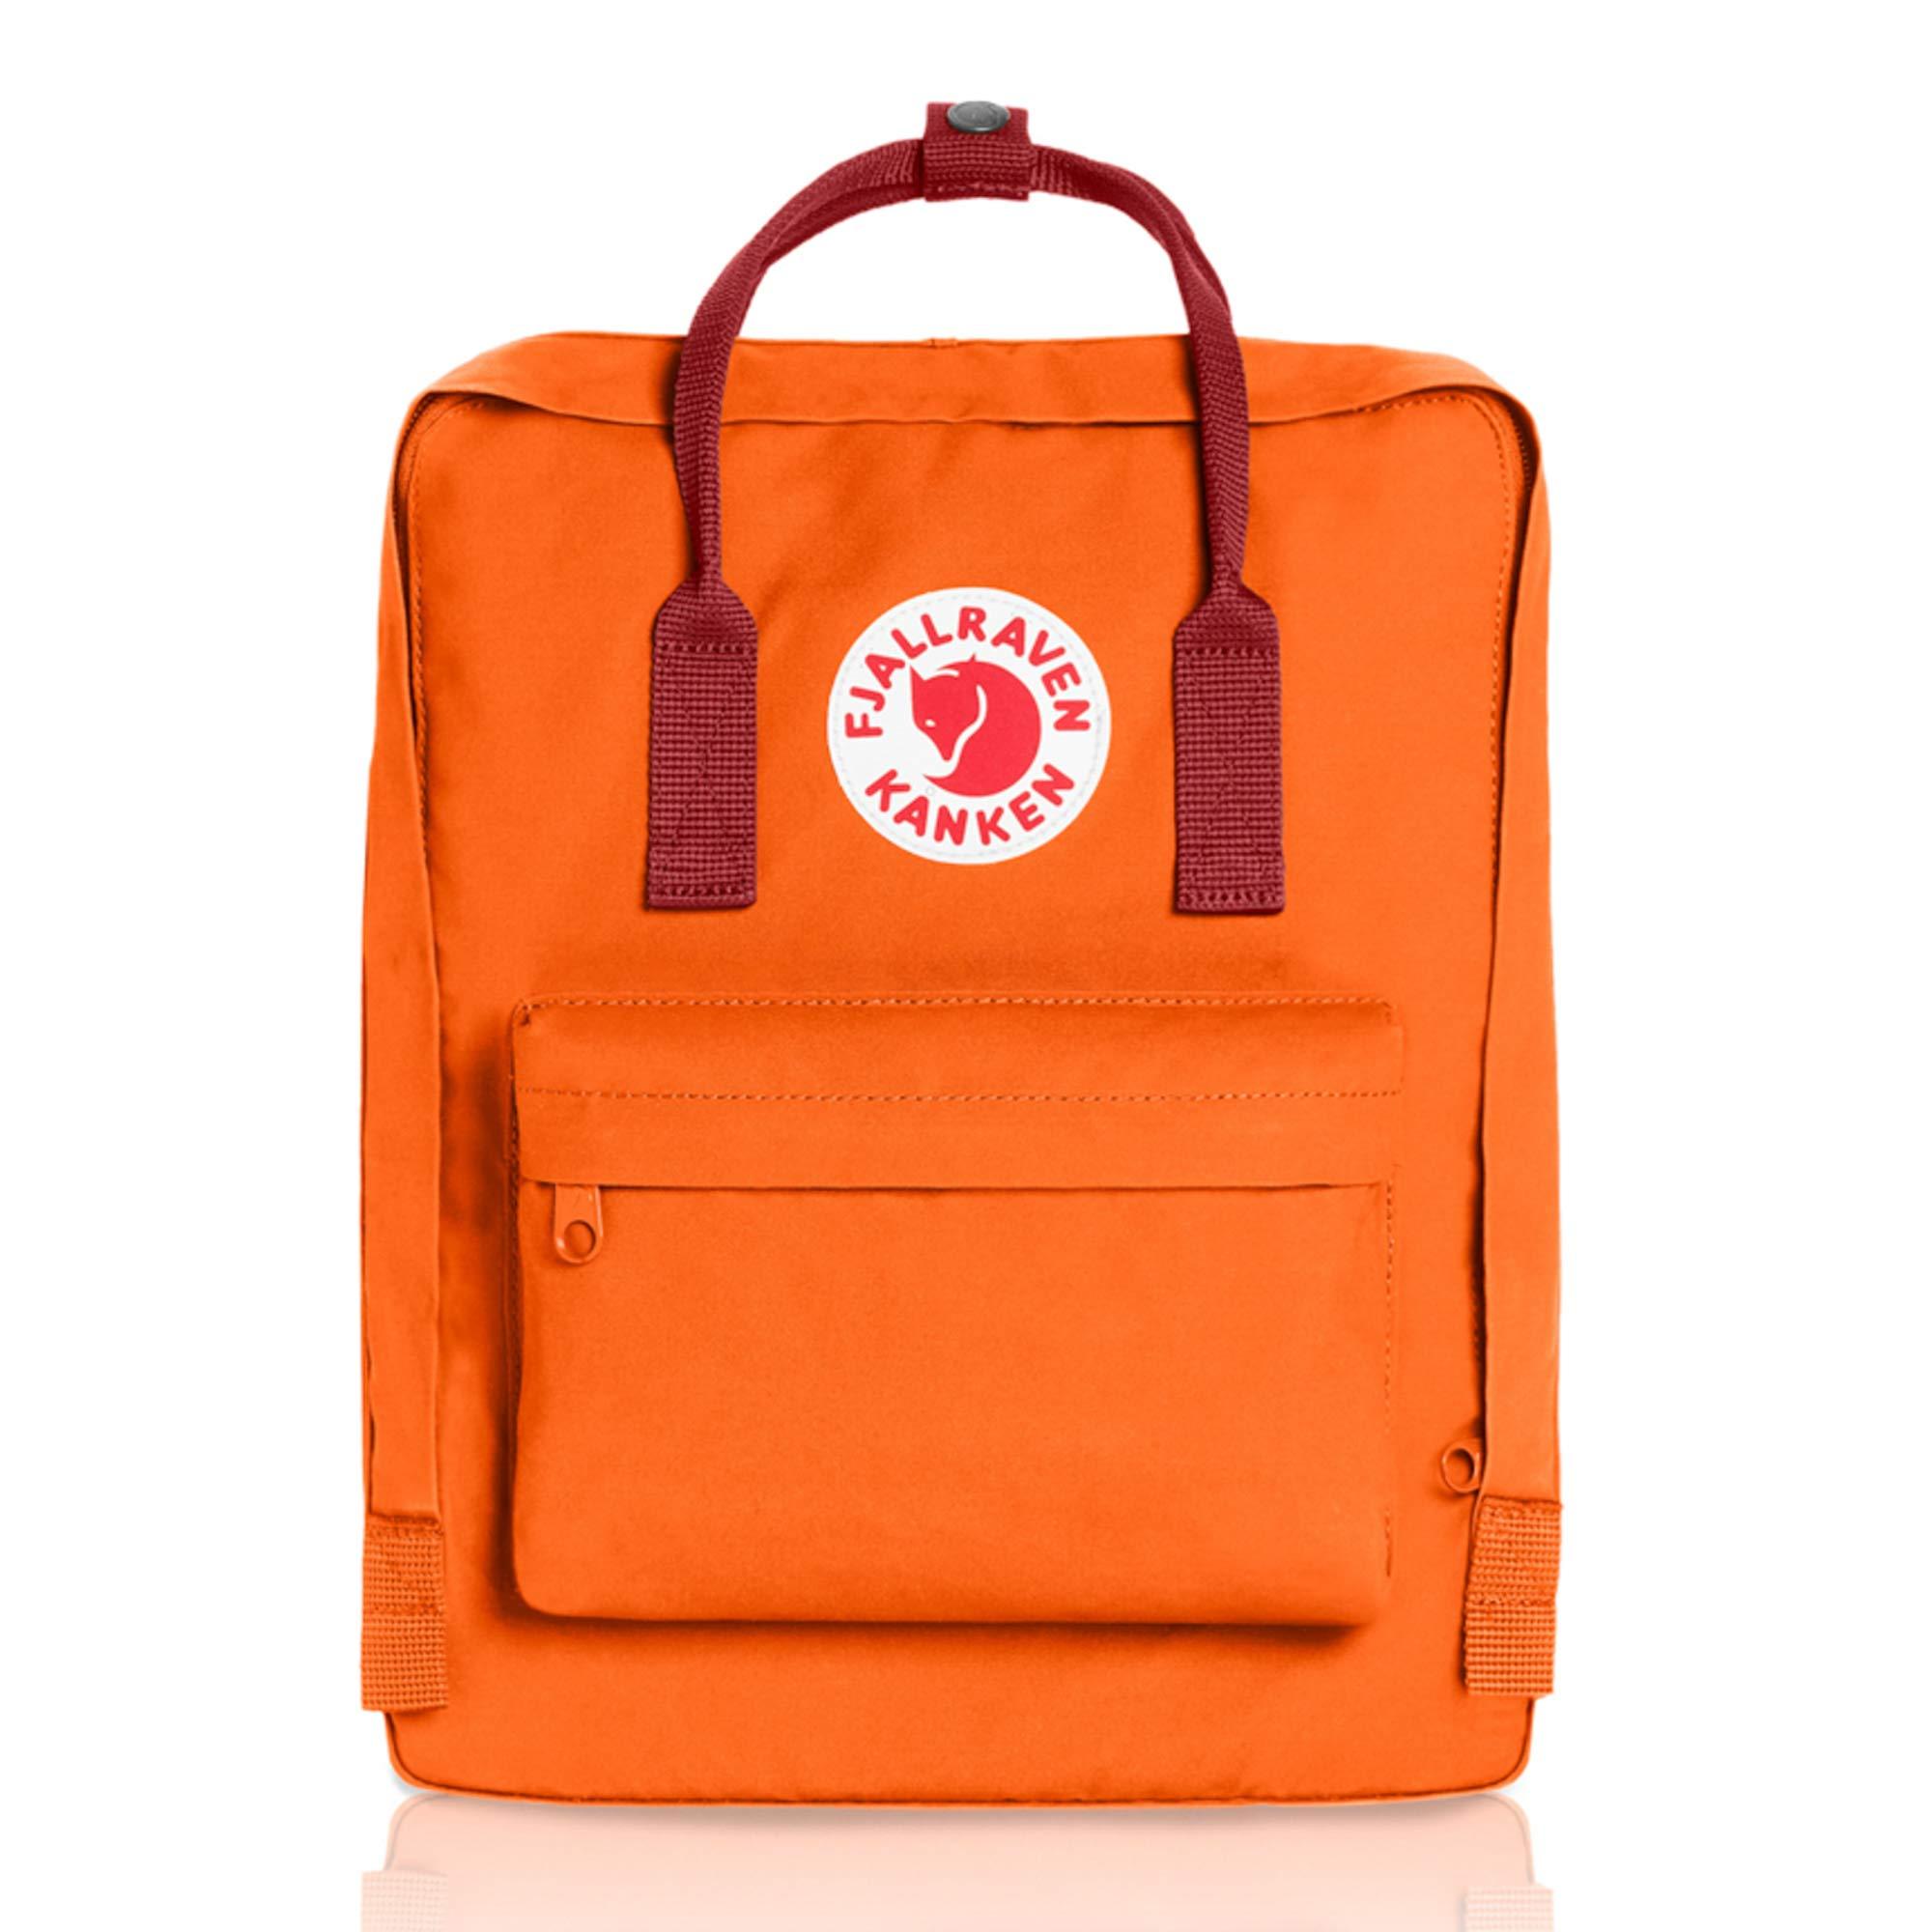 Fjallraven - Kanken Classic Backpack for Everyday, Burnt Orange/Deep Red